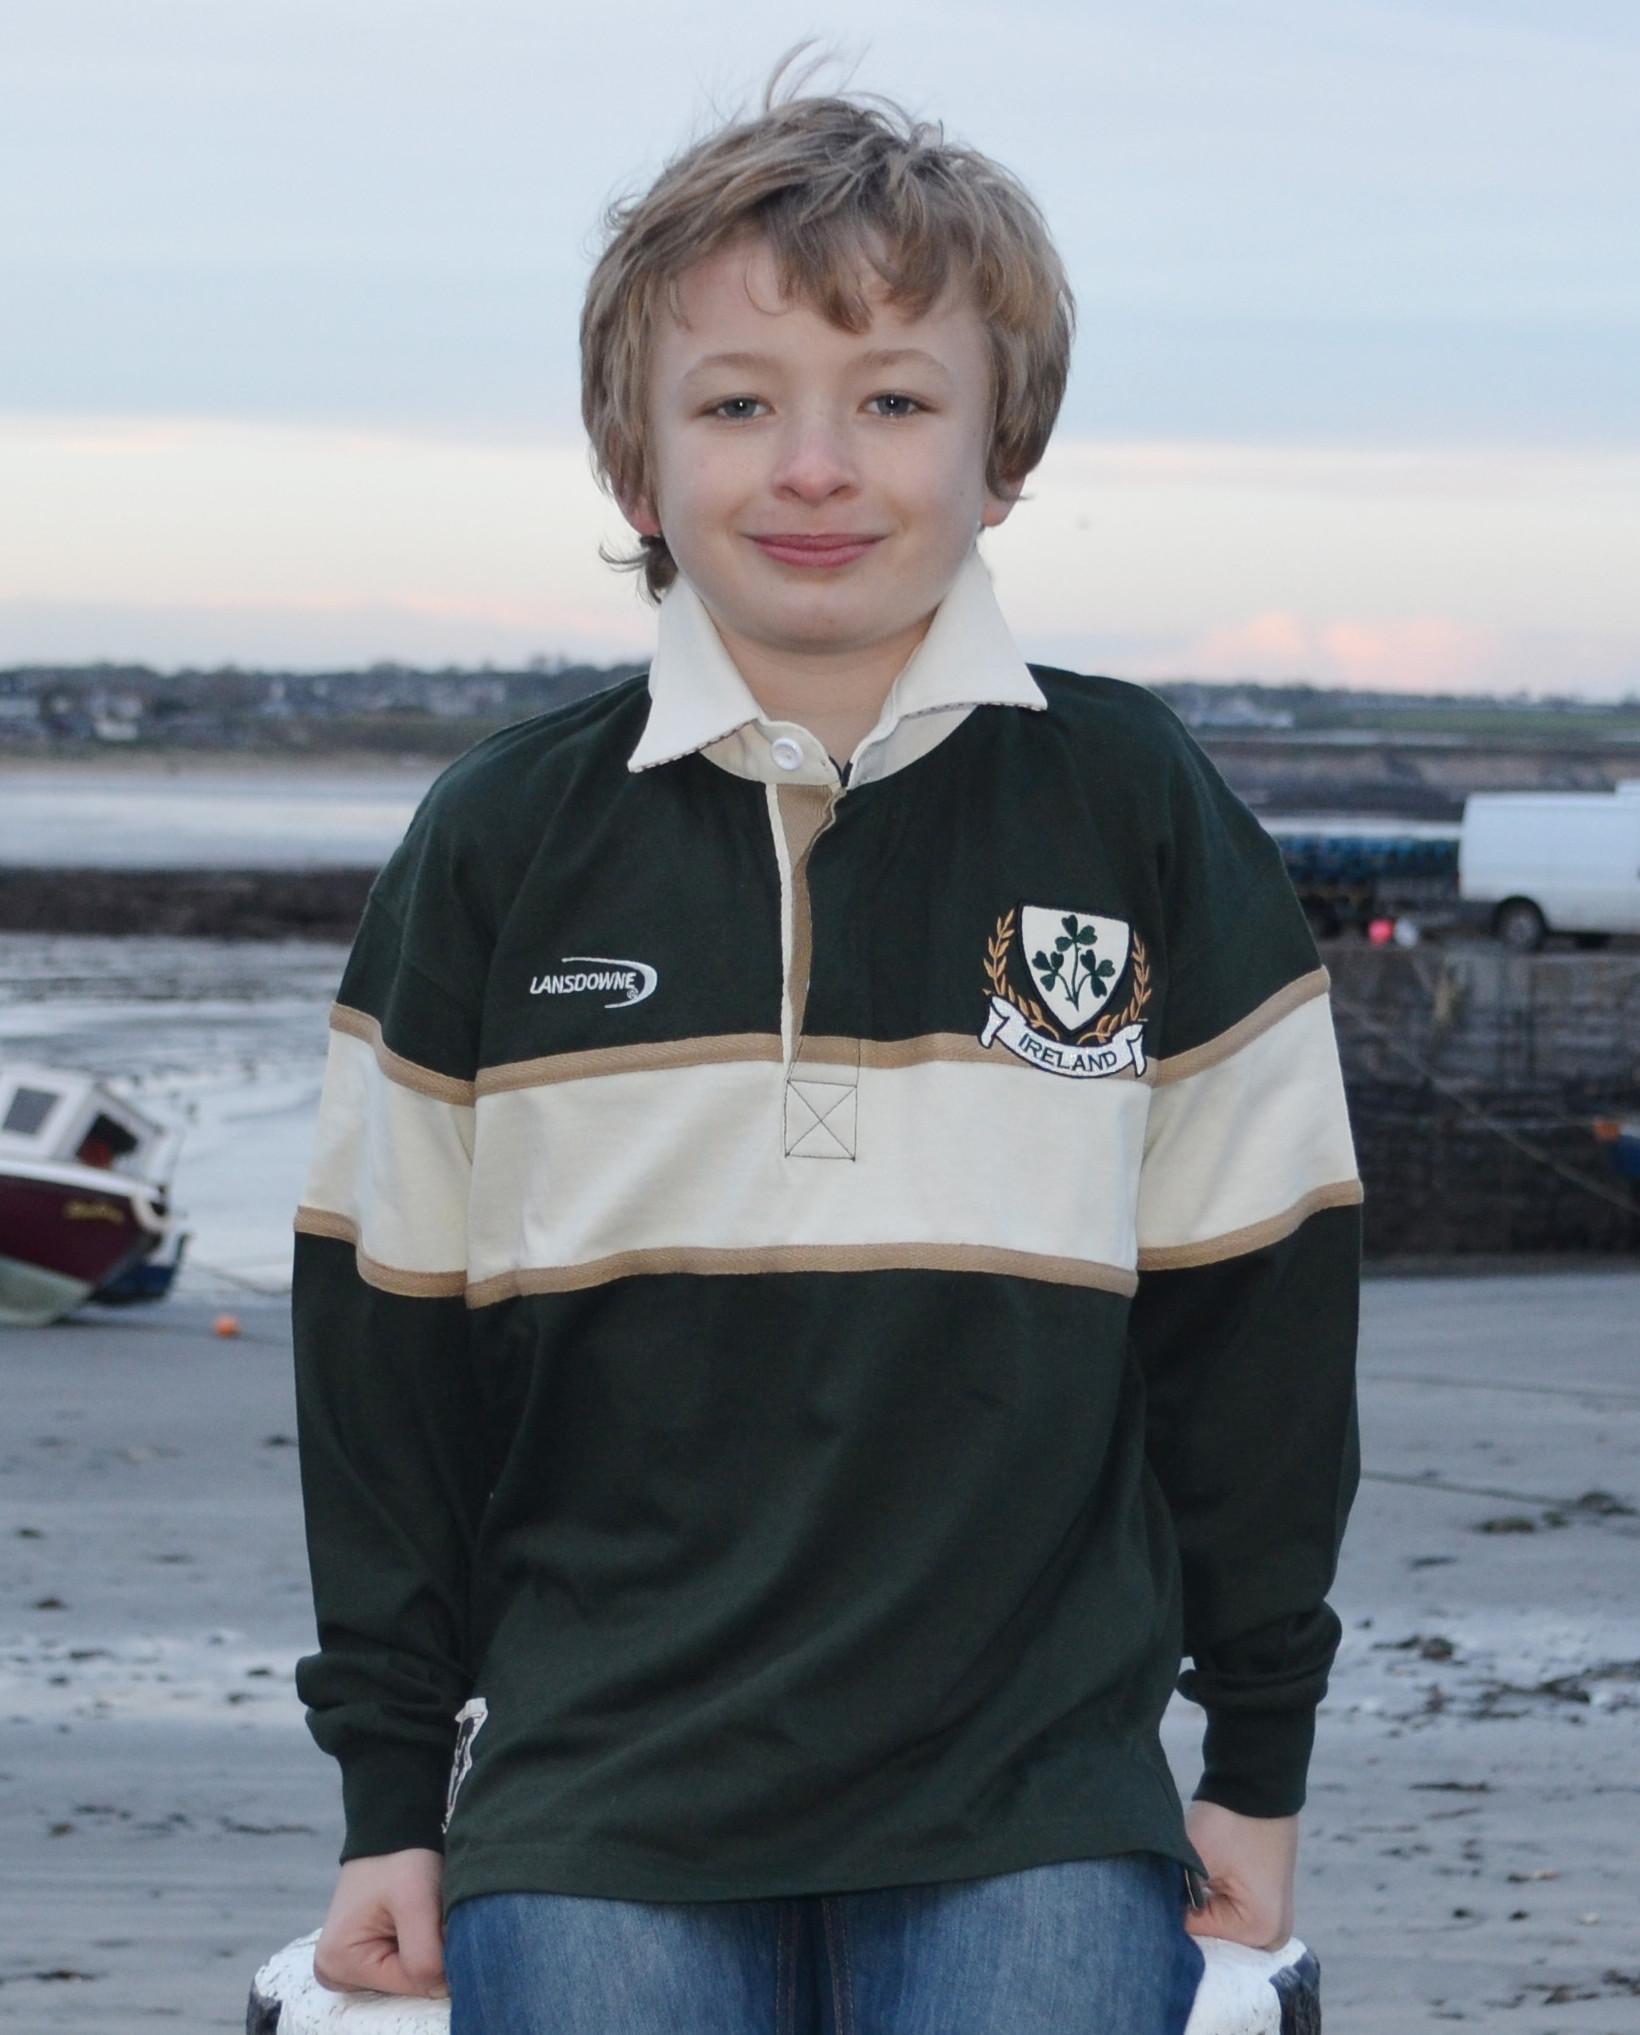 Womens Ireland Rugby Shirt